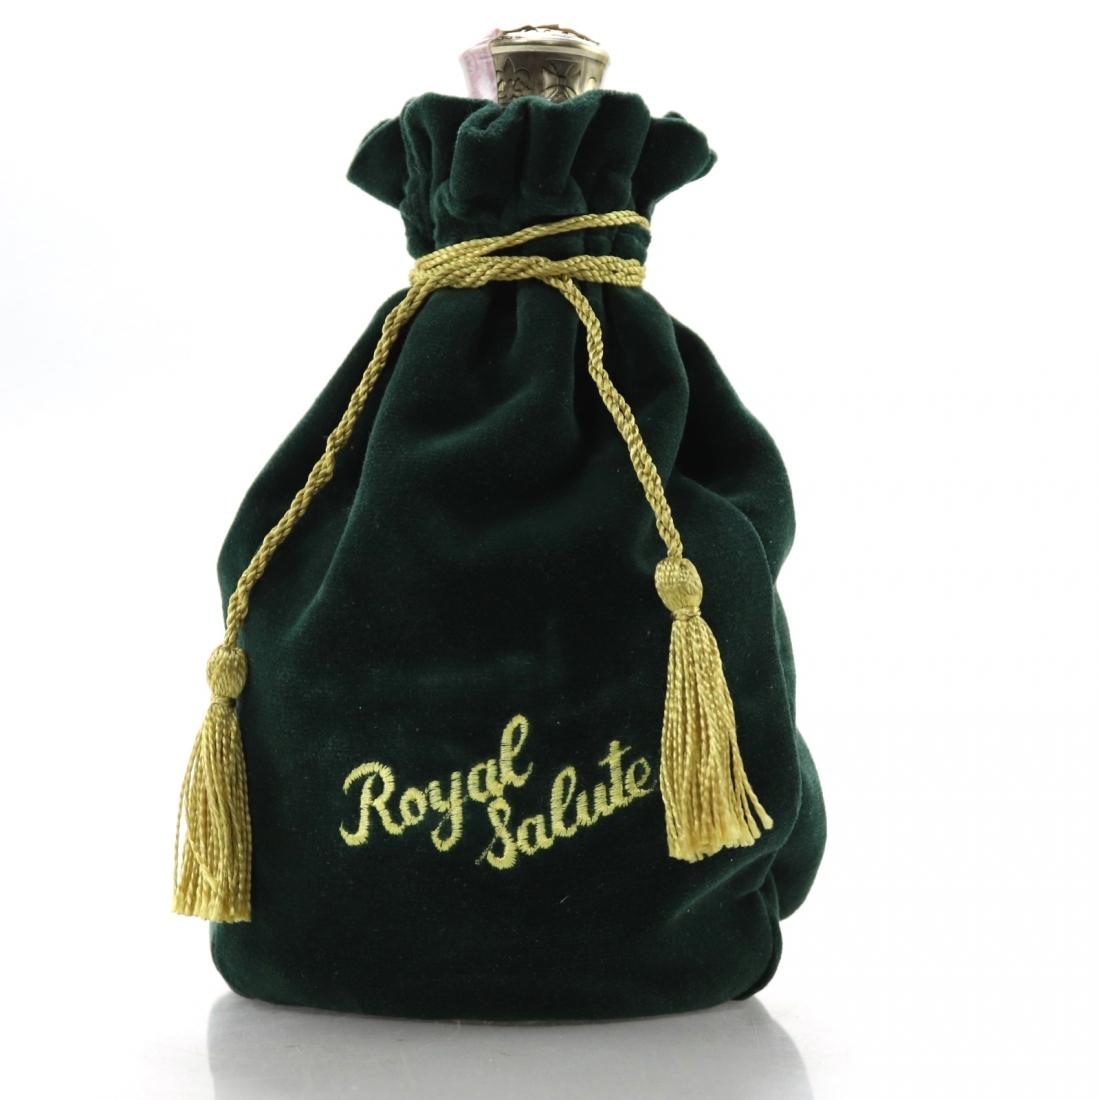 Chivas Regal Royal Salute 21 Year Old / Emerald Flagon